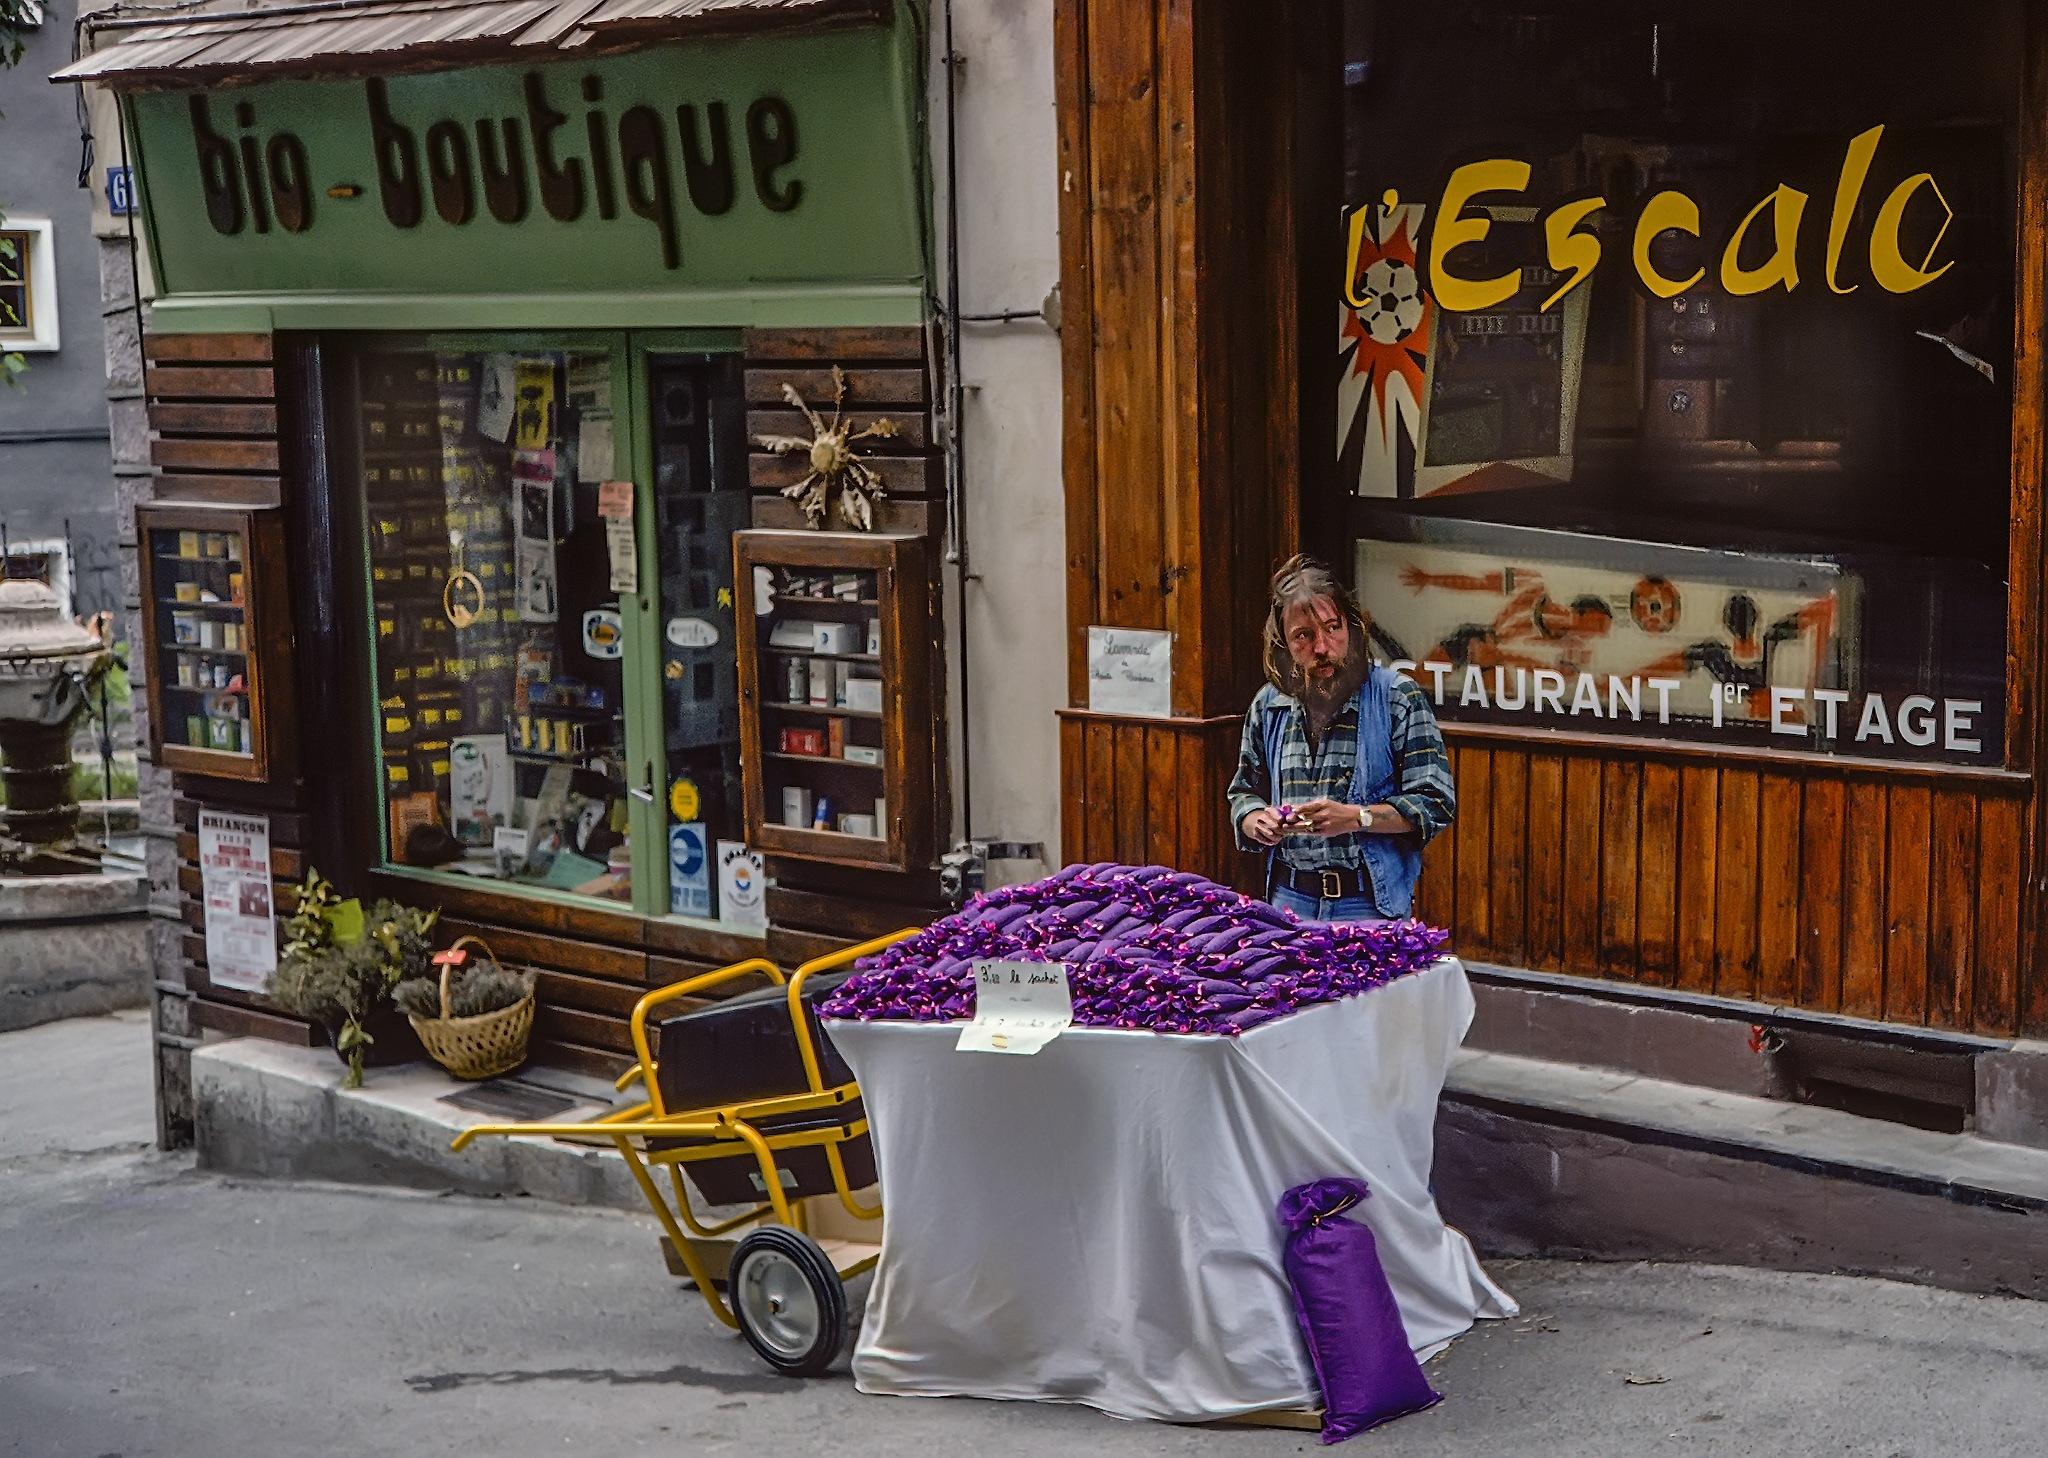 Selling Lavender by Herbert Stachelberger